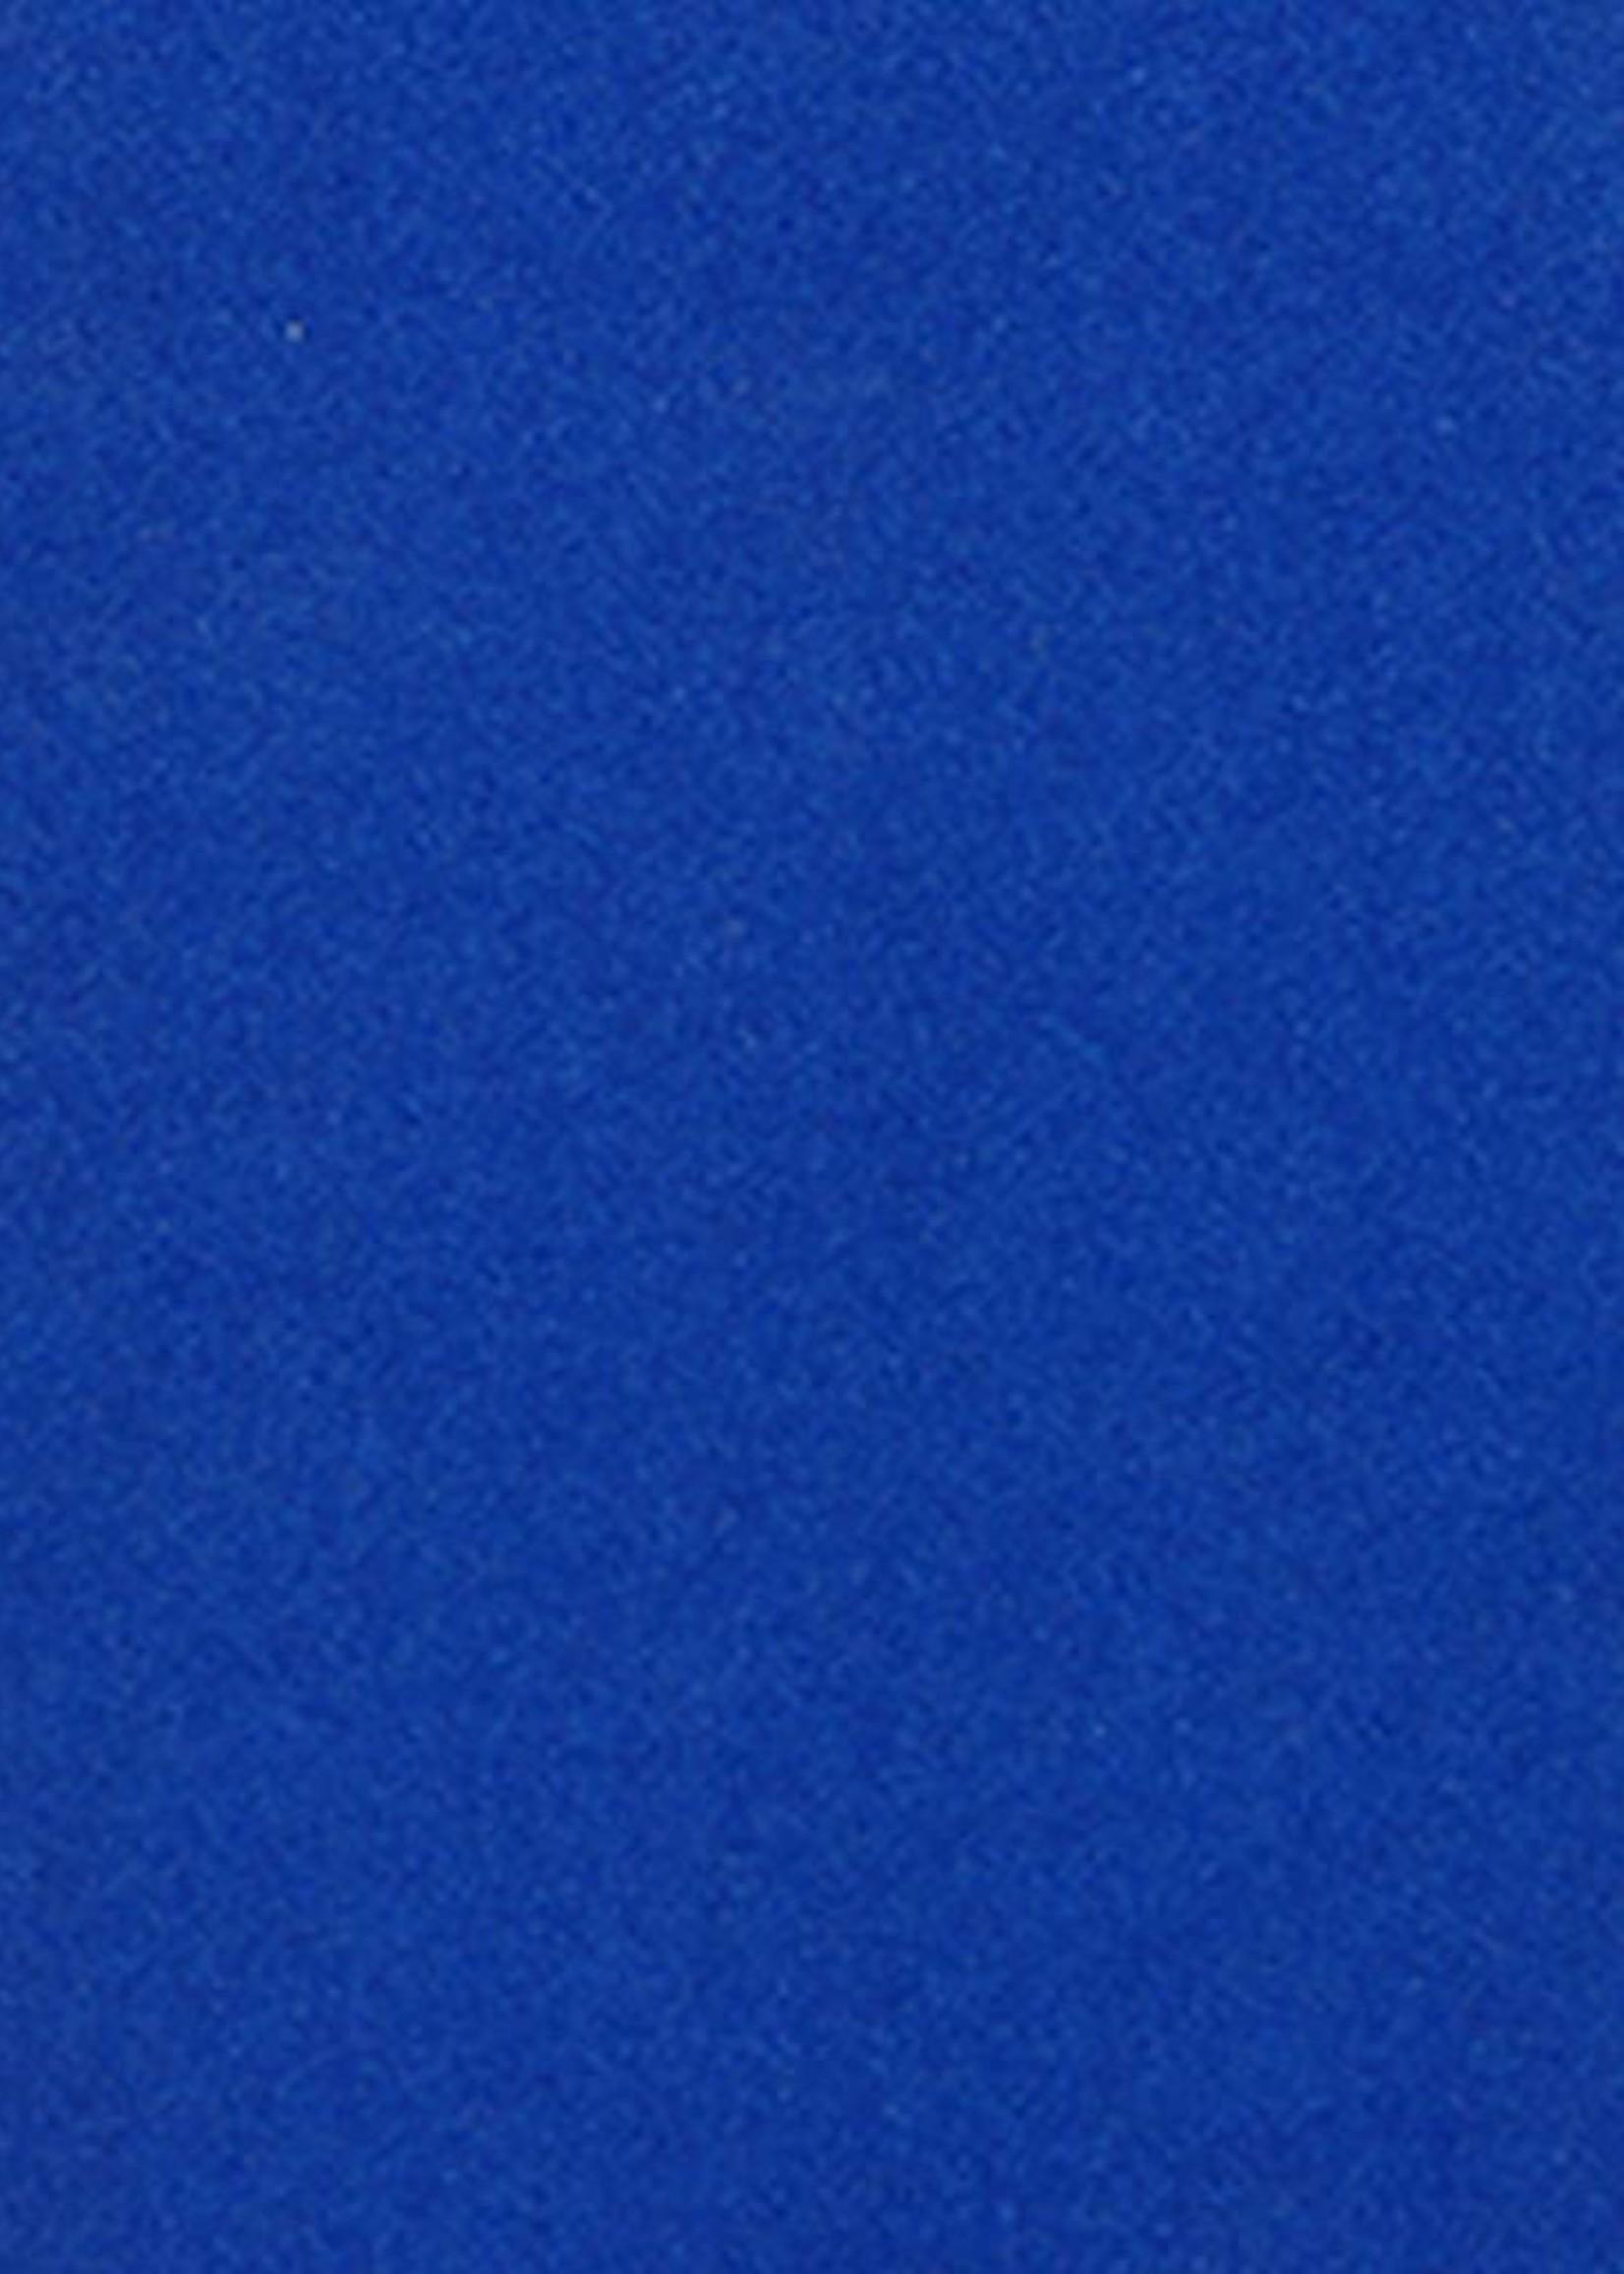 "Vision Street Wear Vision Color Griptape Sheet 9"" x 33"" Blue"